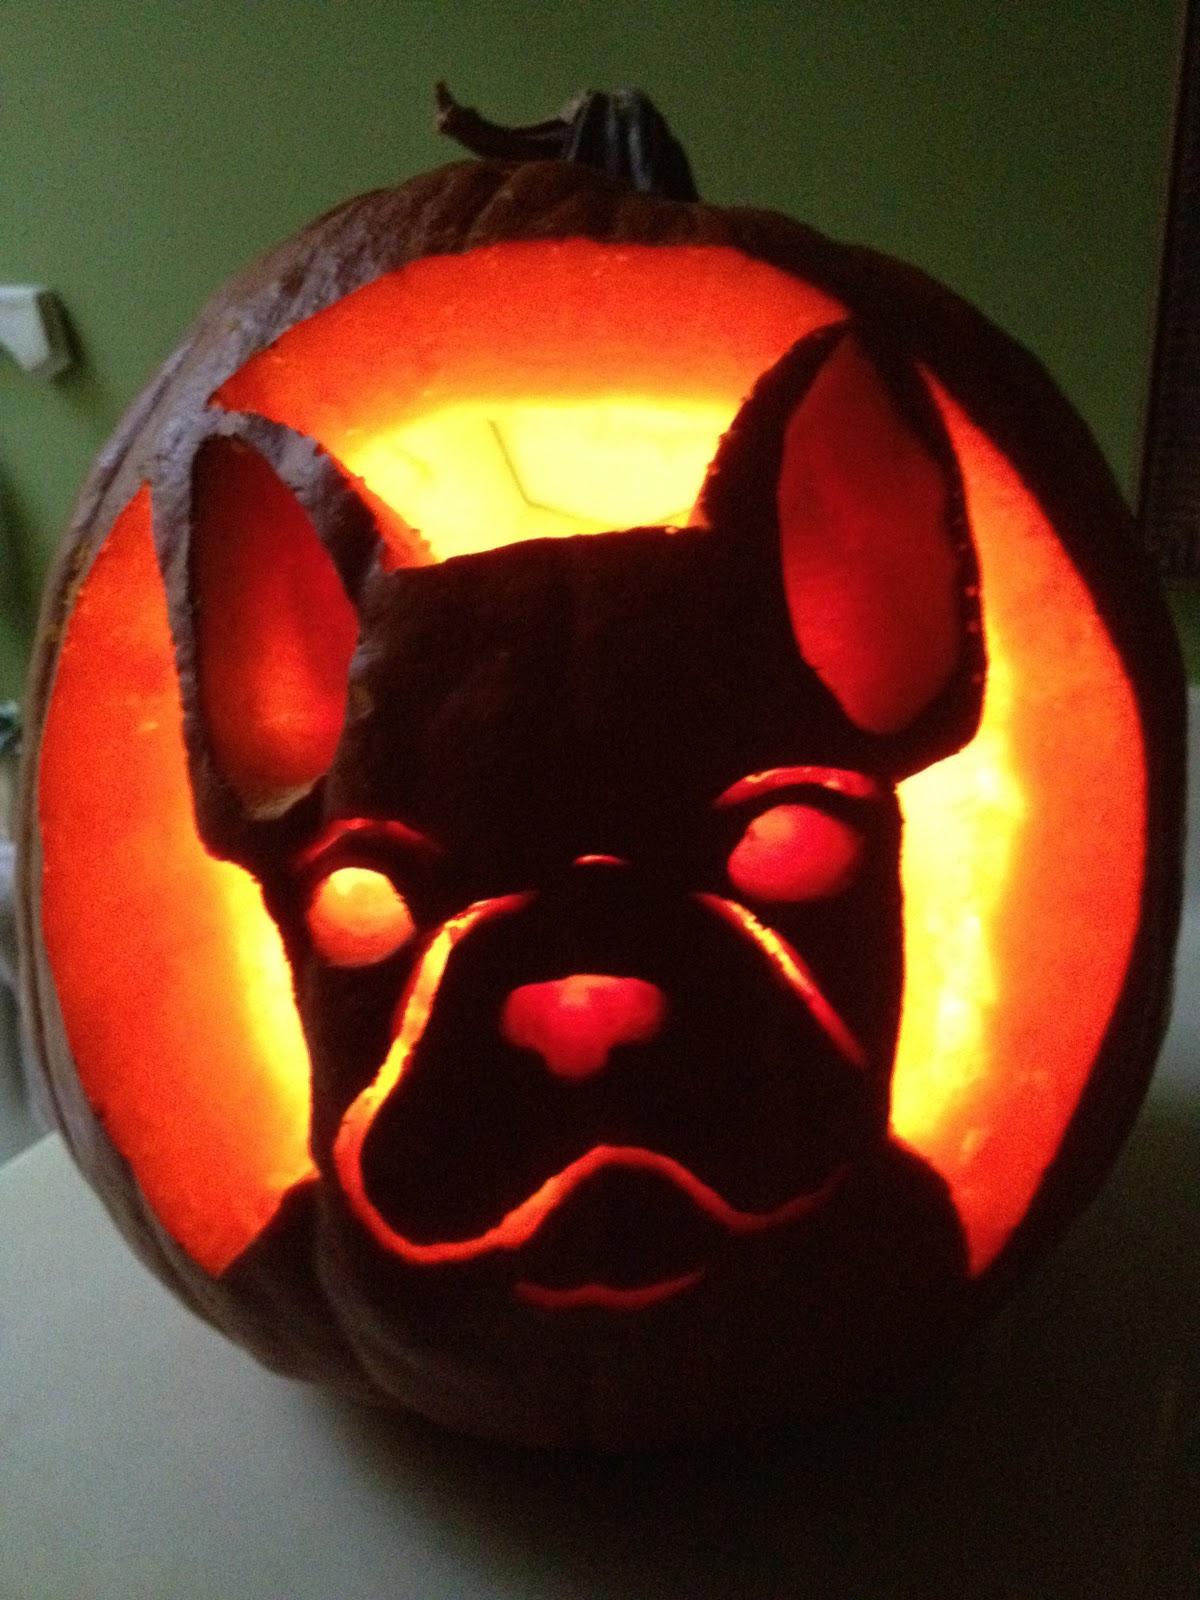 bulldog pumpkin pic 6 aaxoowkl educationadda info u2022 rh 6 aaxoowkl educationadda info